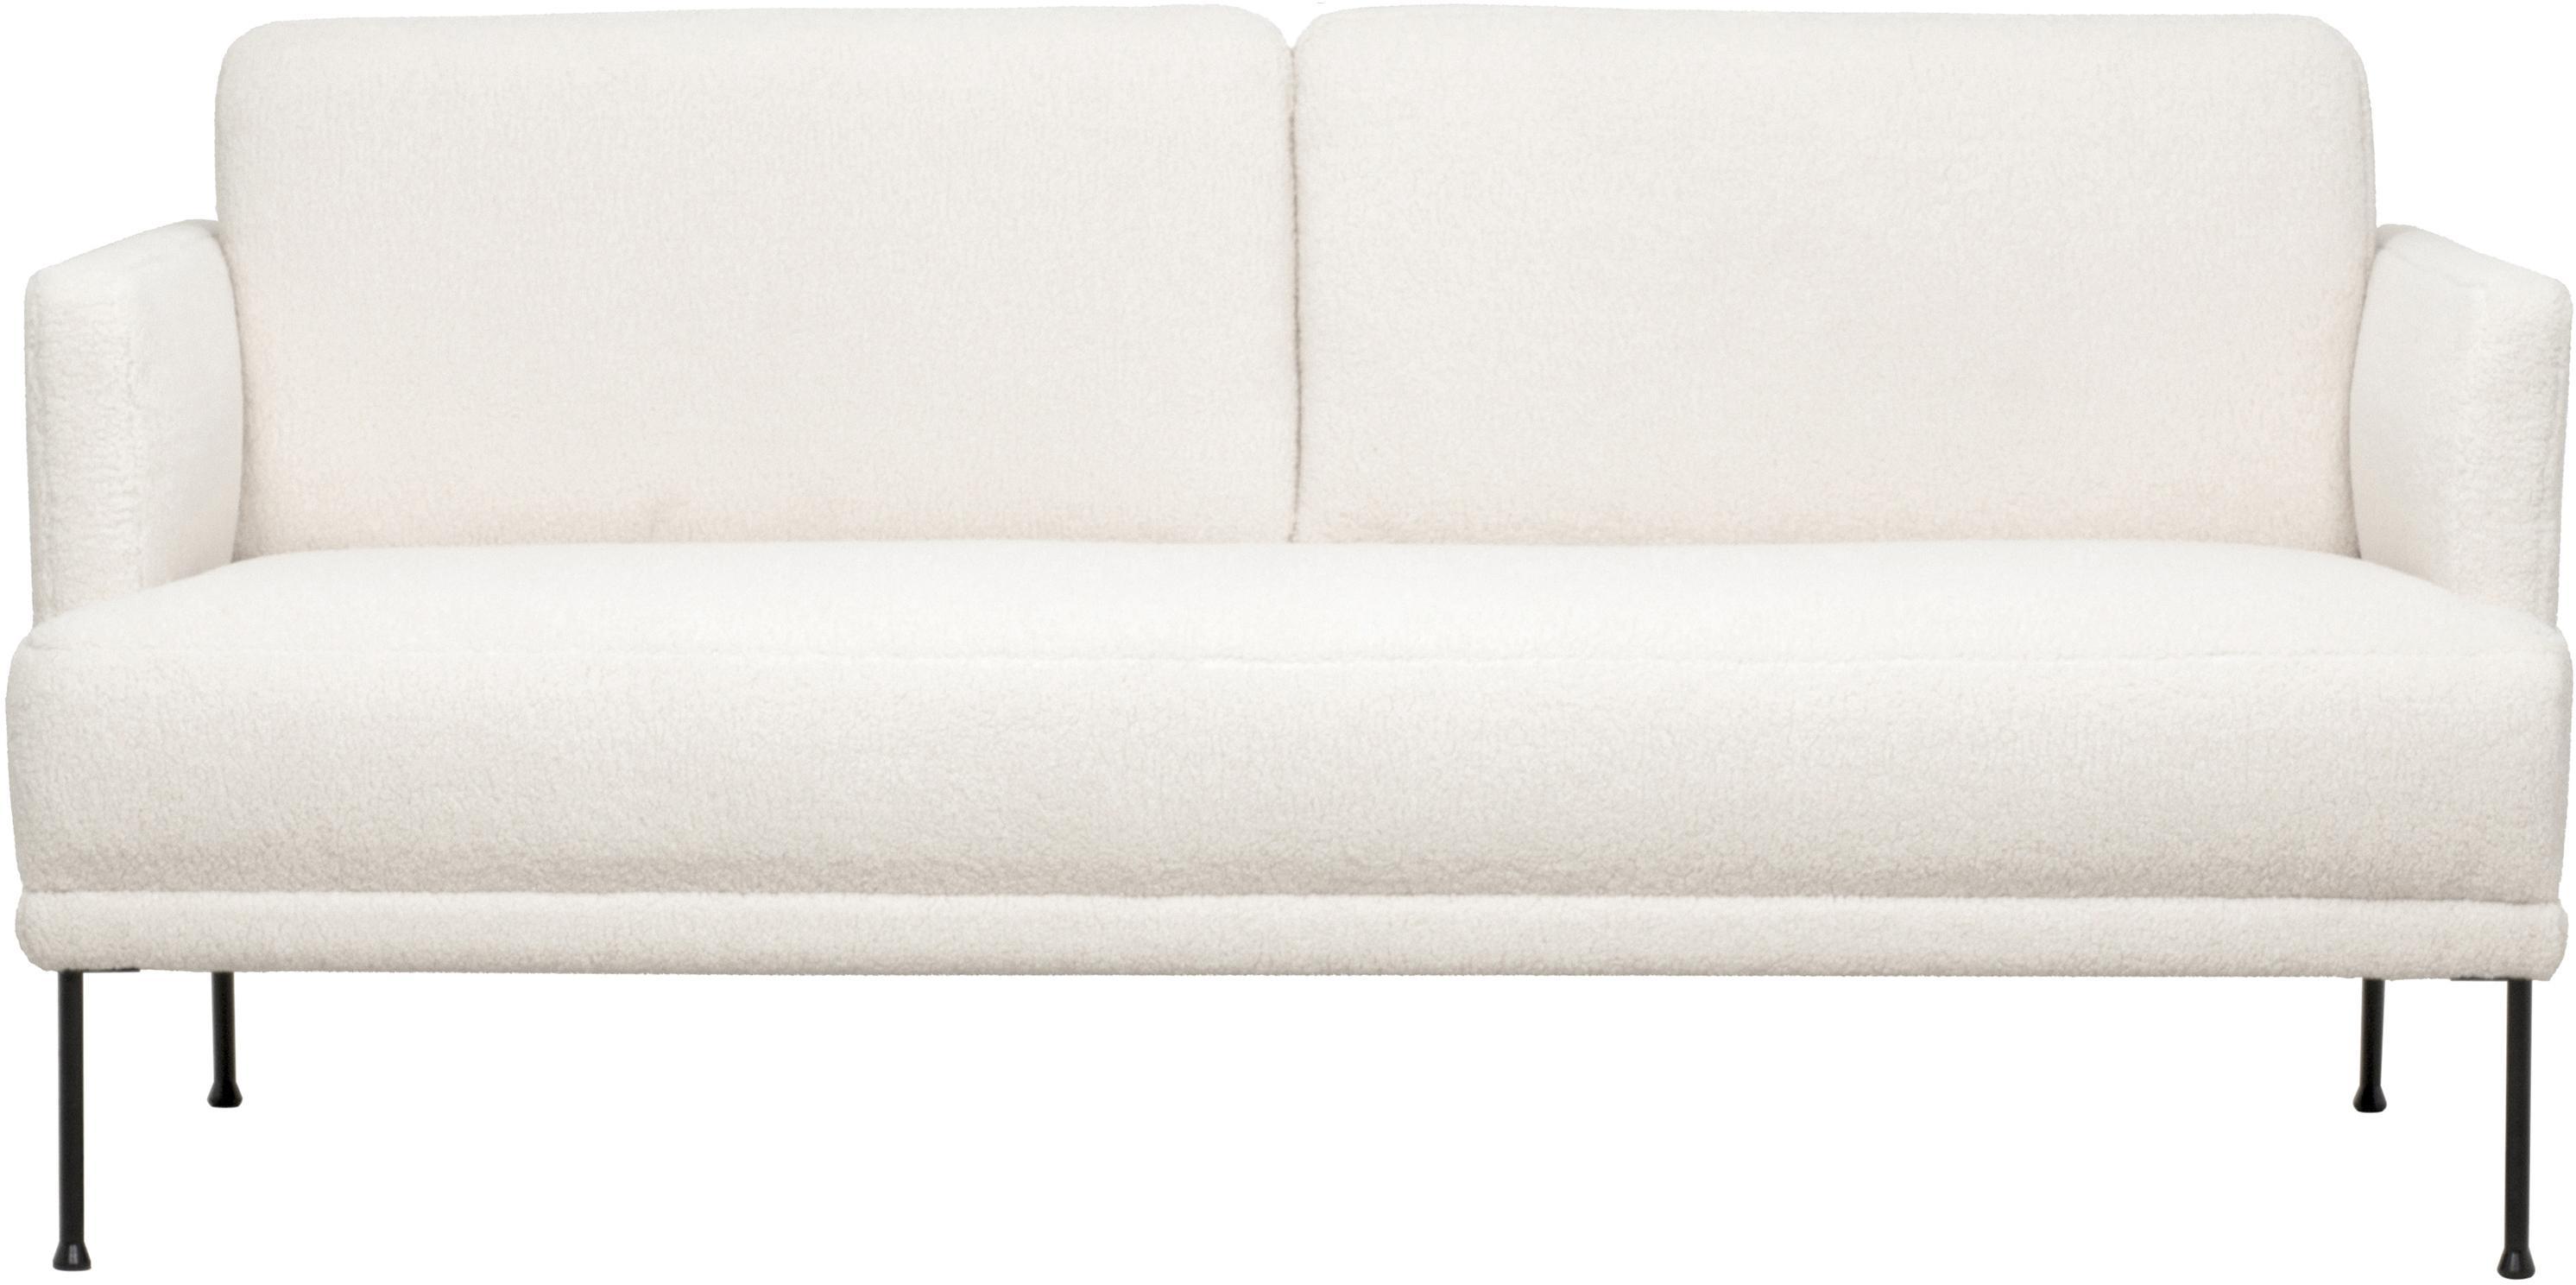 Teddy bank Fluente (2-zits), Bekleding: 100% polyester (Teddyfell, Frame: massief grenenhout, Poten: gepoedercoat metaal, Crèmewit, B 166 x D 85 cm